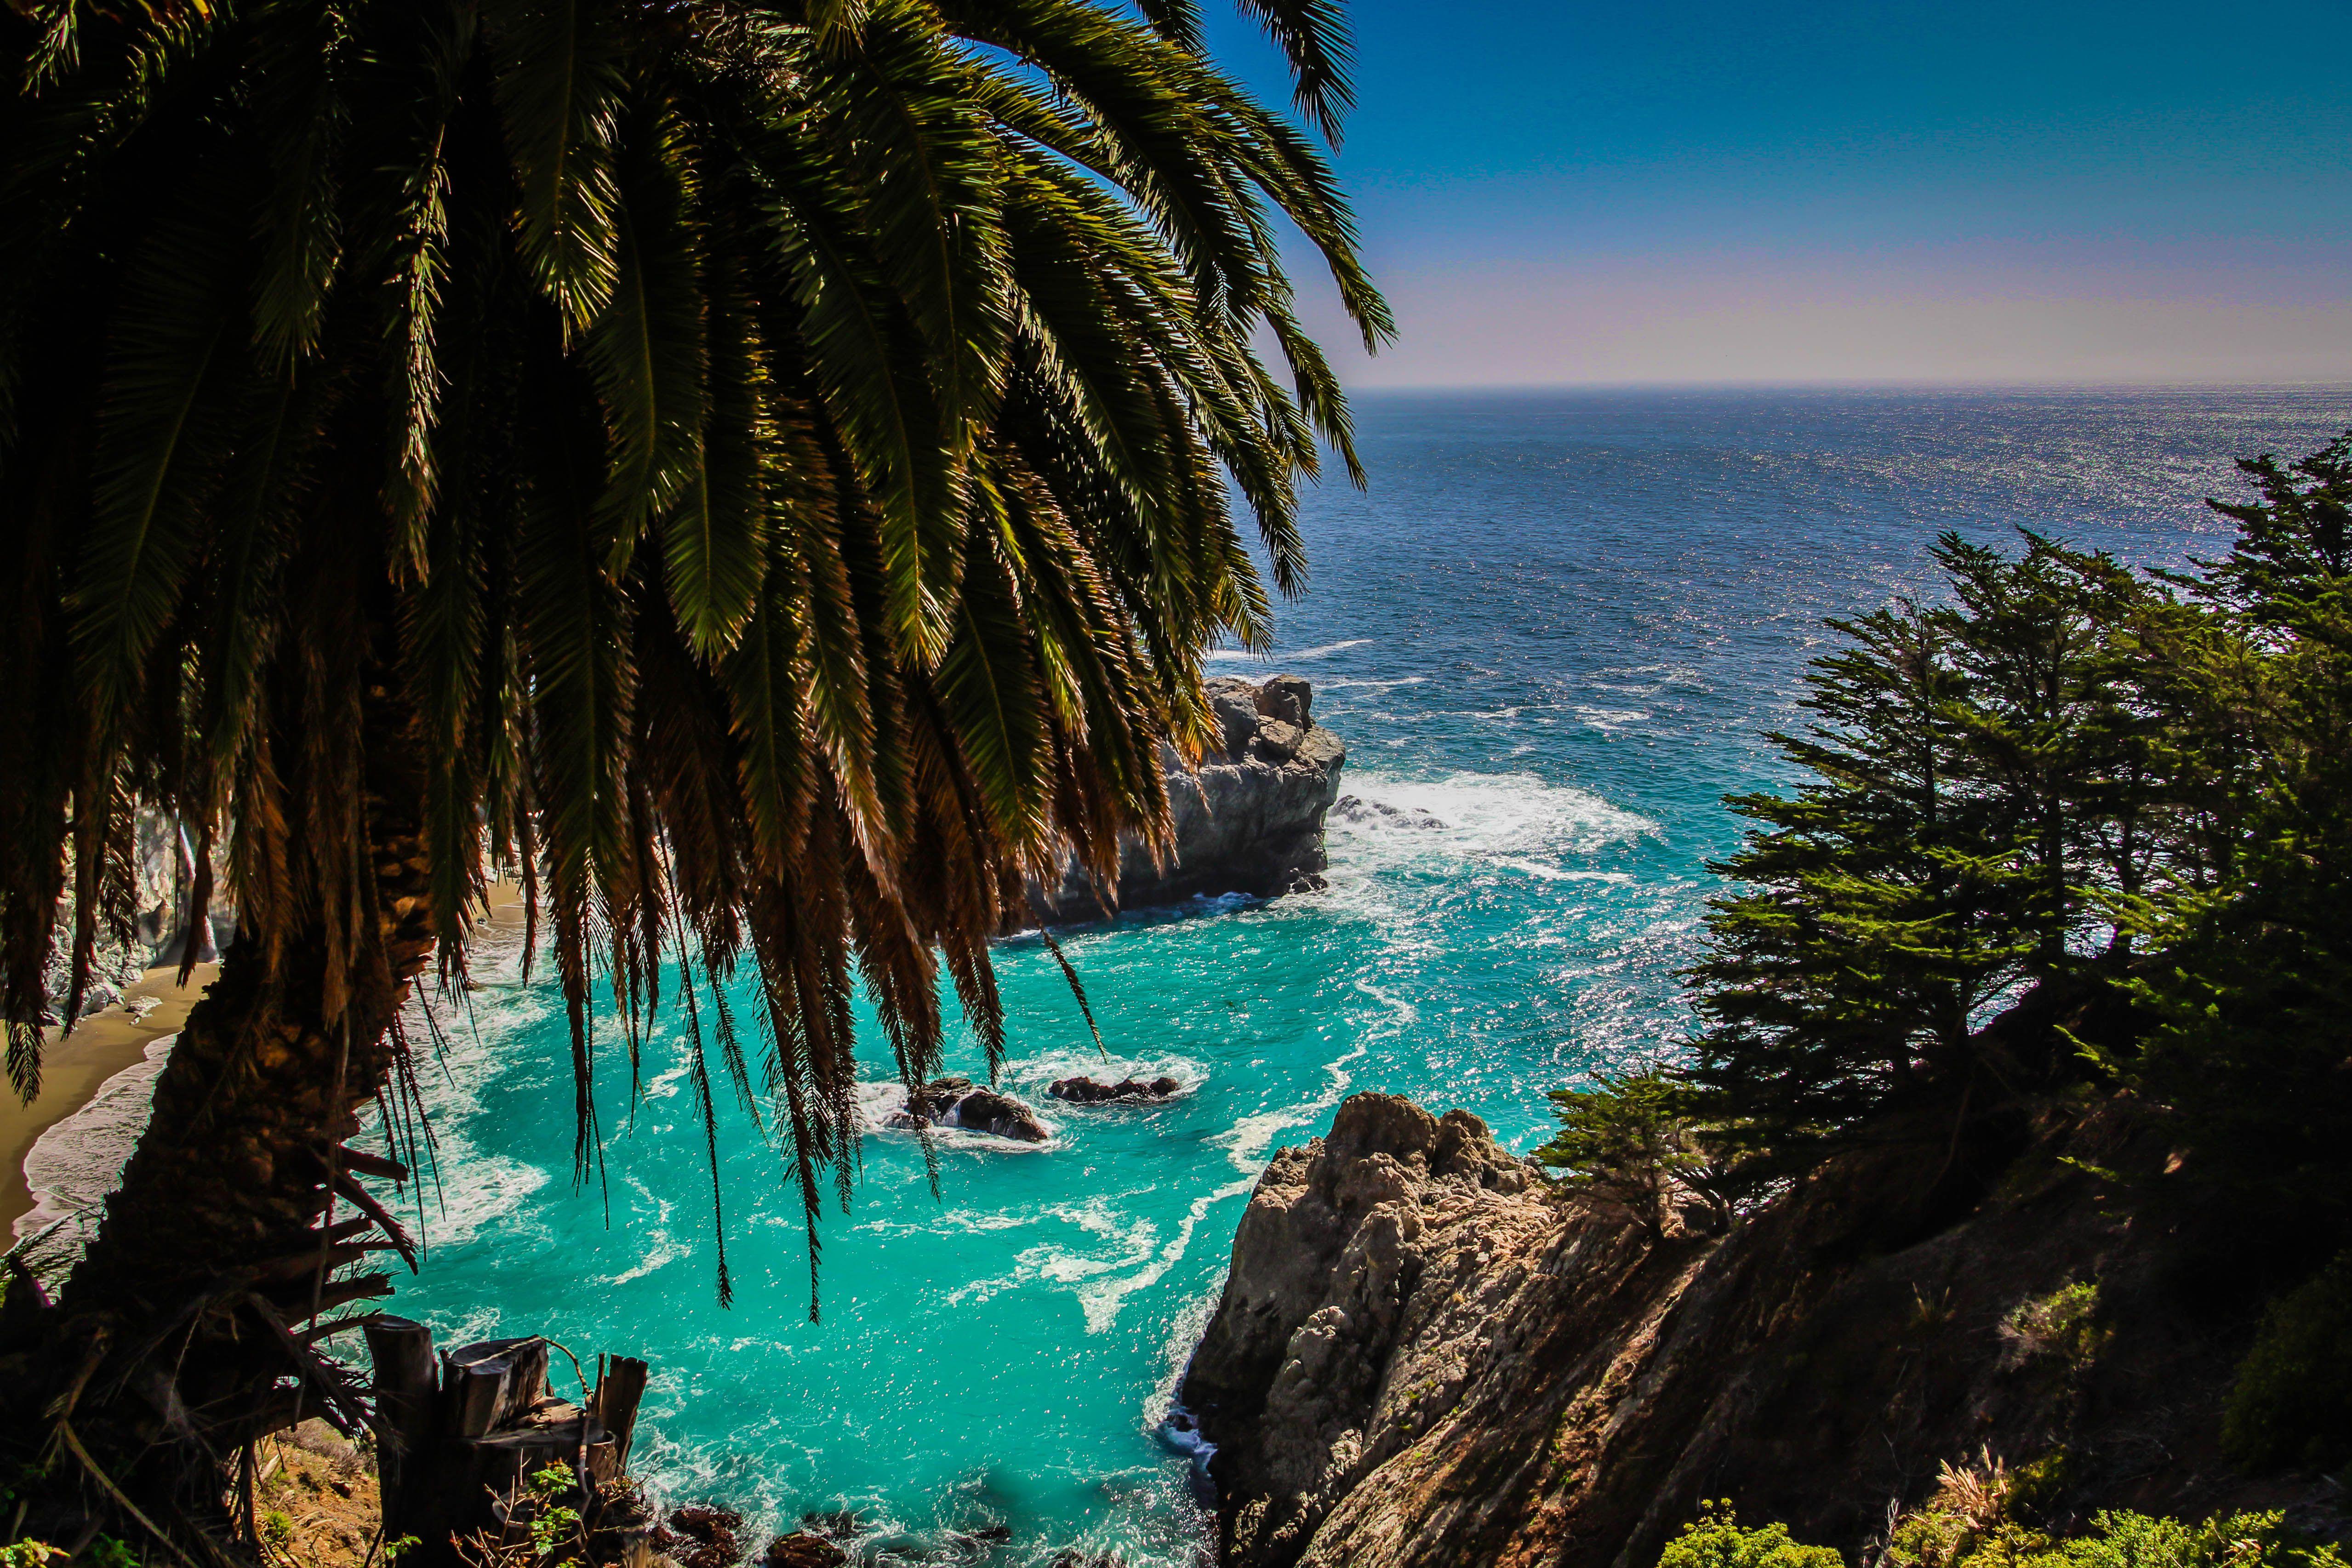 Pacific Ocean Big Sur California Beach 4k Hd Desktop: Palm Tree Over McWay Cove In Big Sur, CA